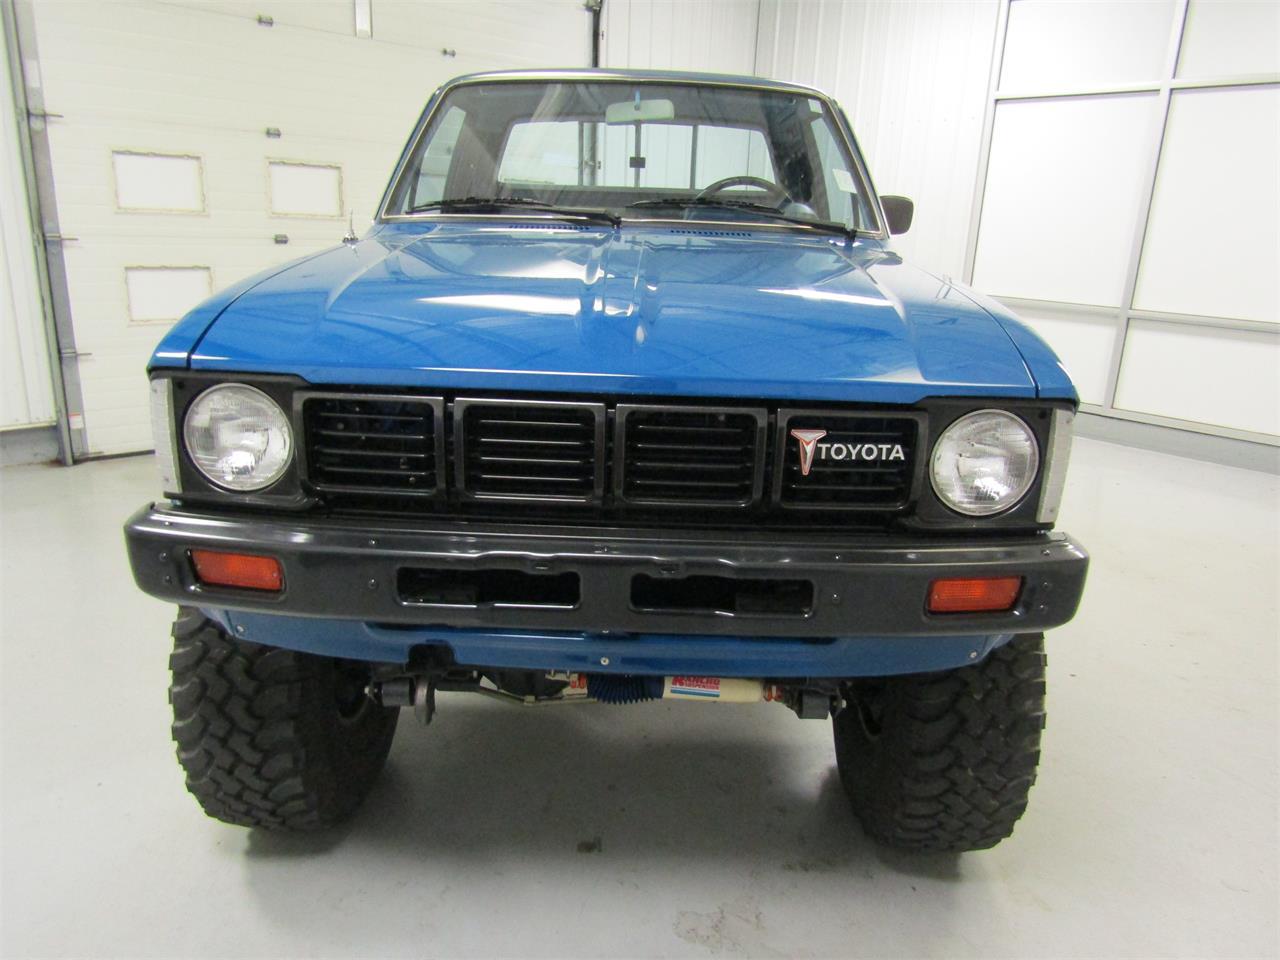 Toyota Dealers In Az >> 1980 Toyota HiLux for Sale | ClassicCars.com | CC-1090103